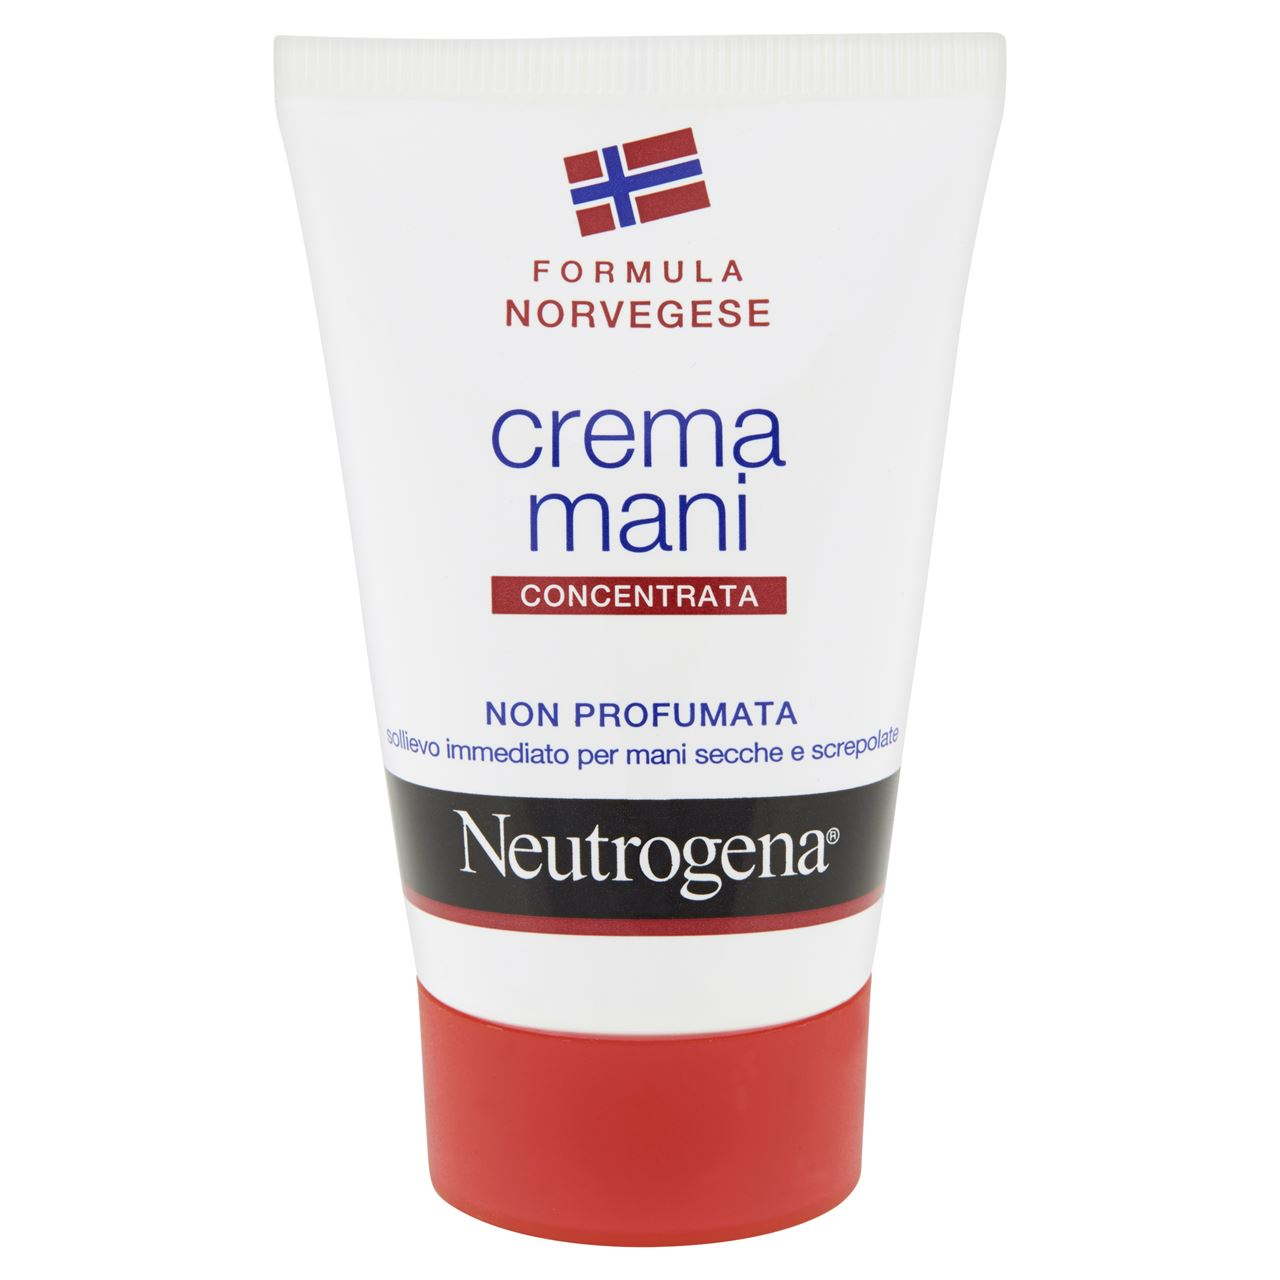 Neutrogena Crema Mani Concentrata Senza Profumo 50ml